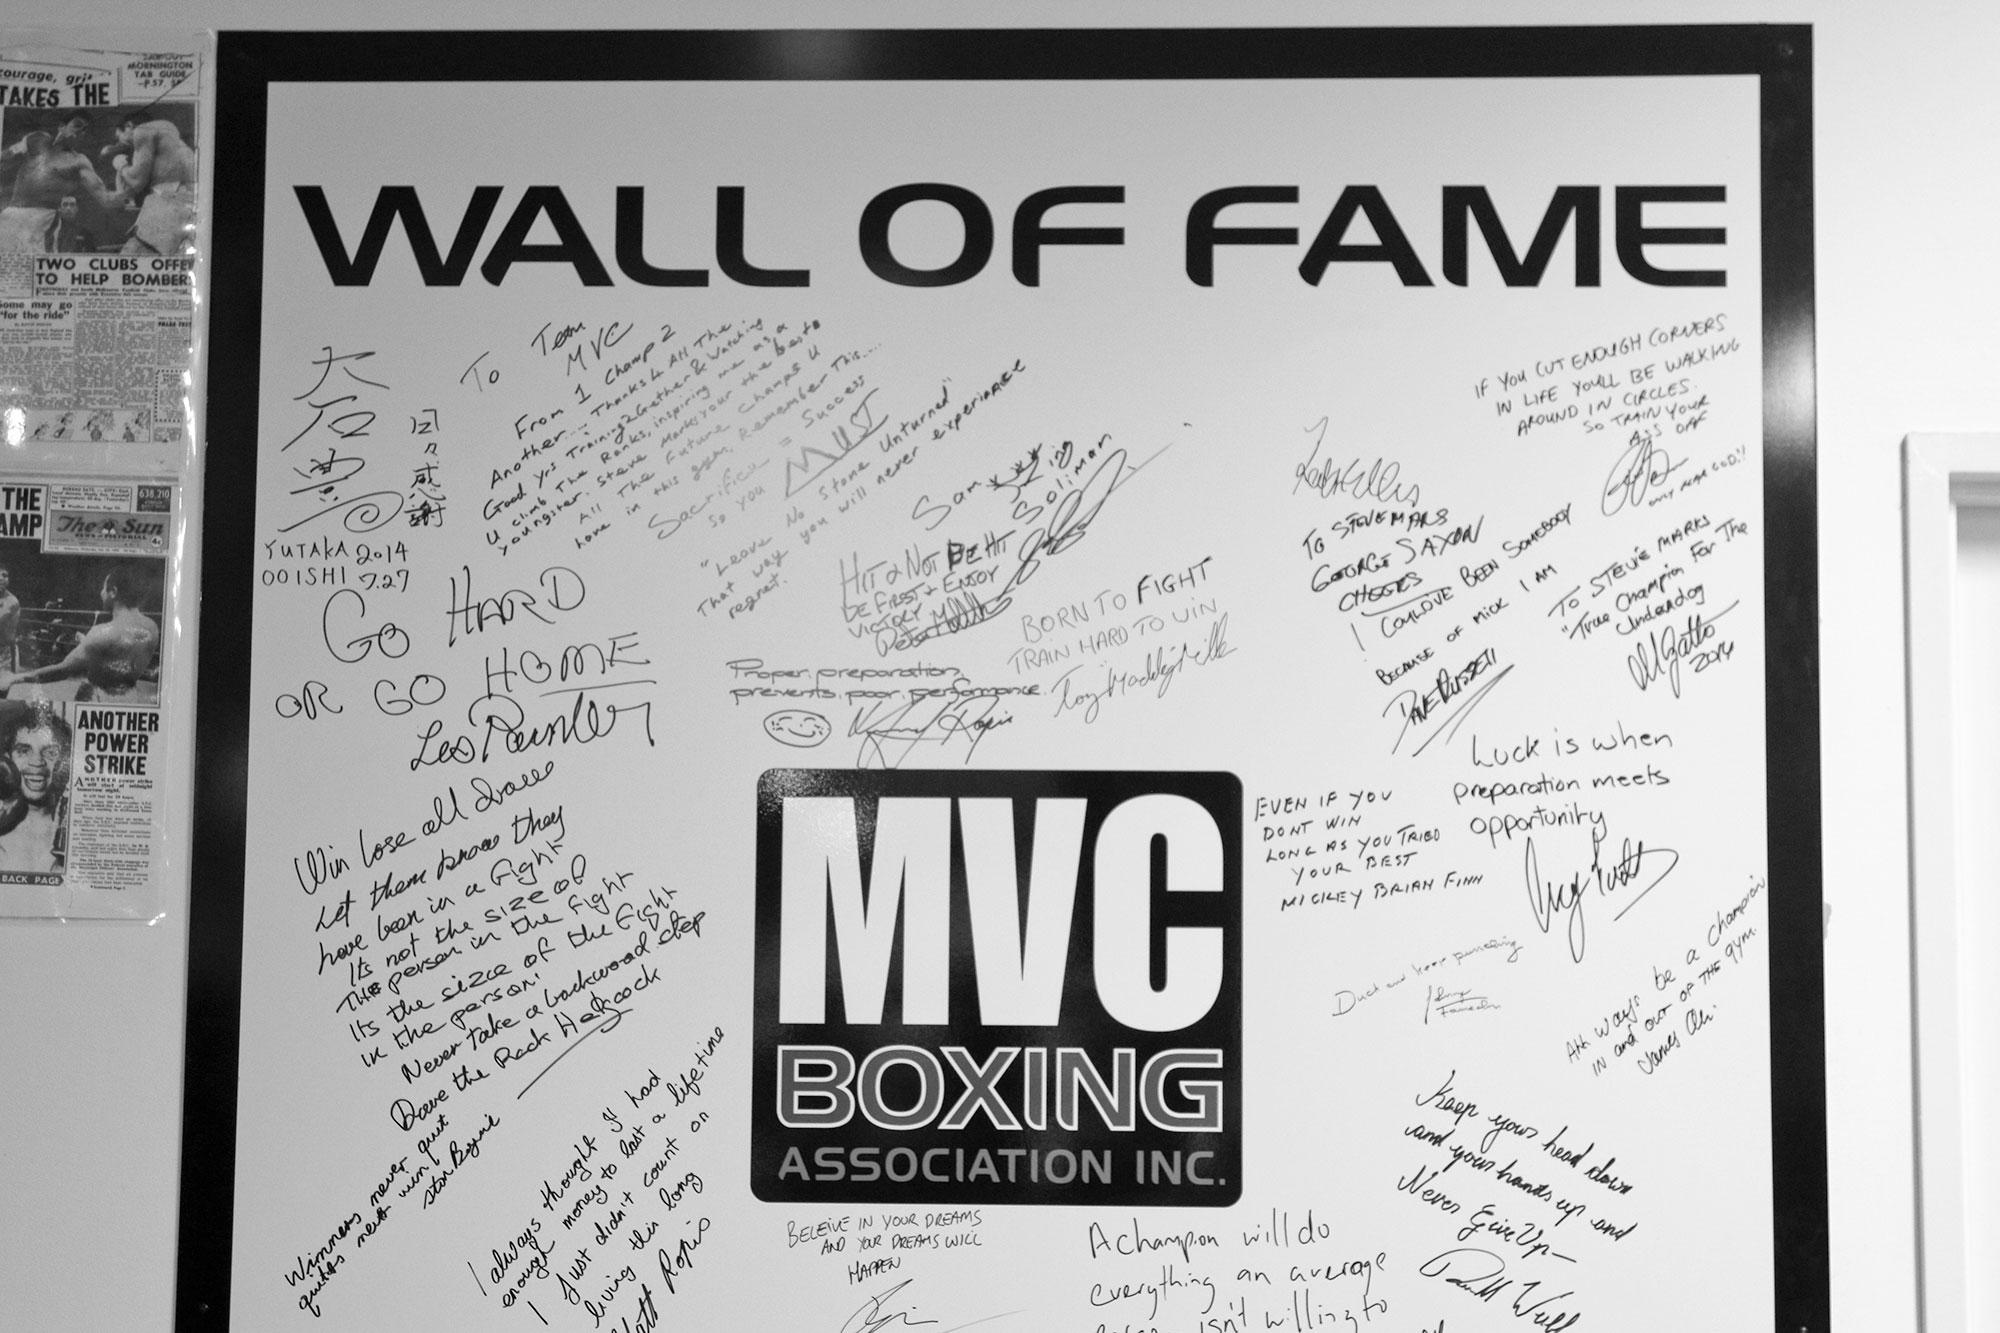 MVC Boxing - Wall of Fame